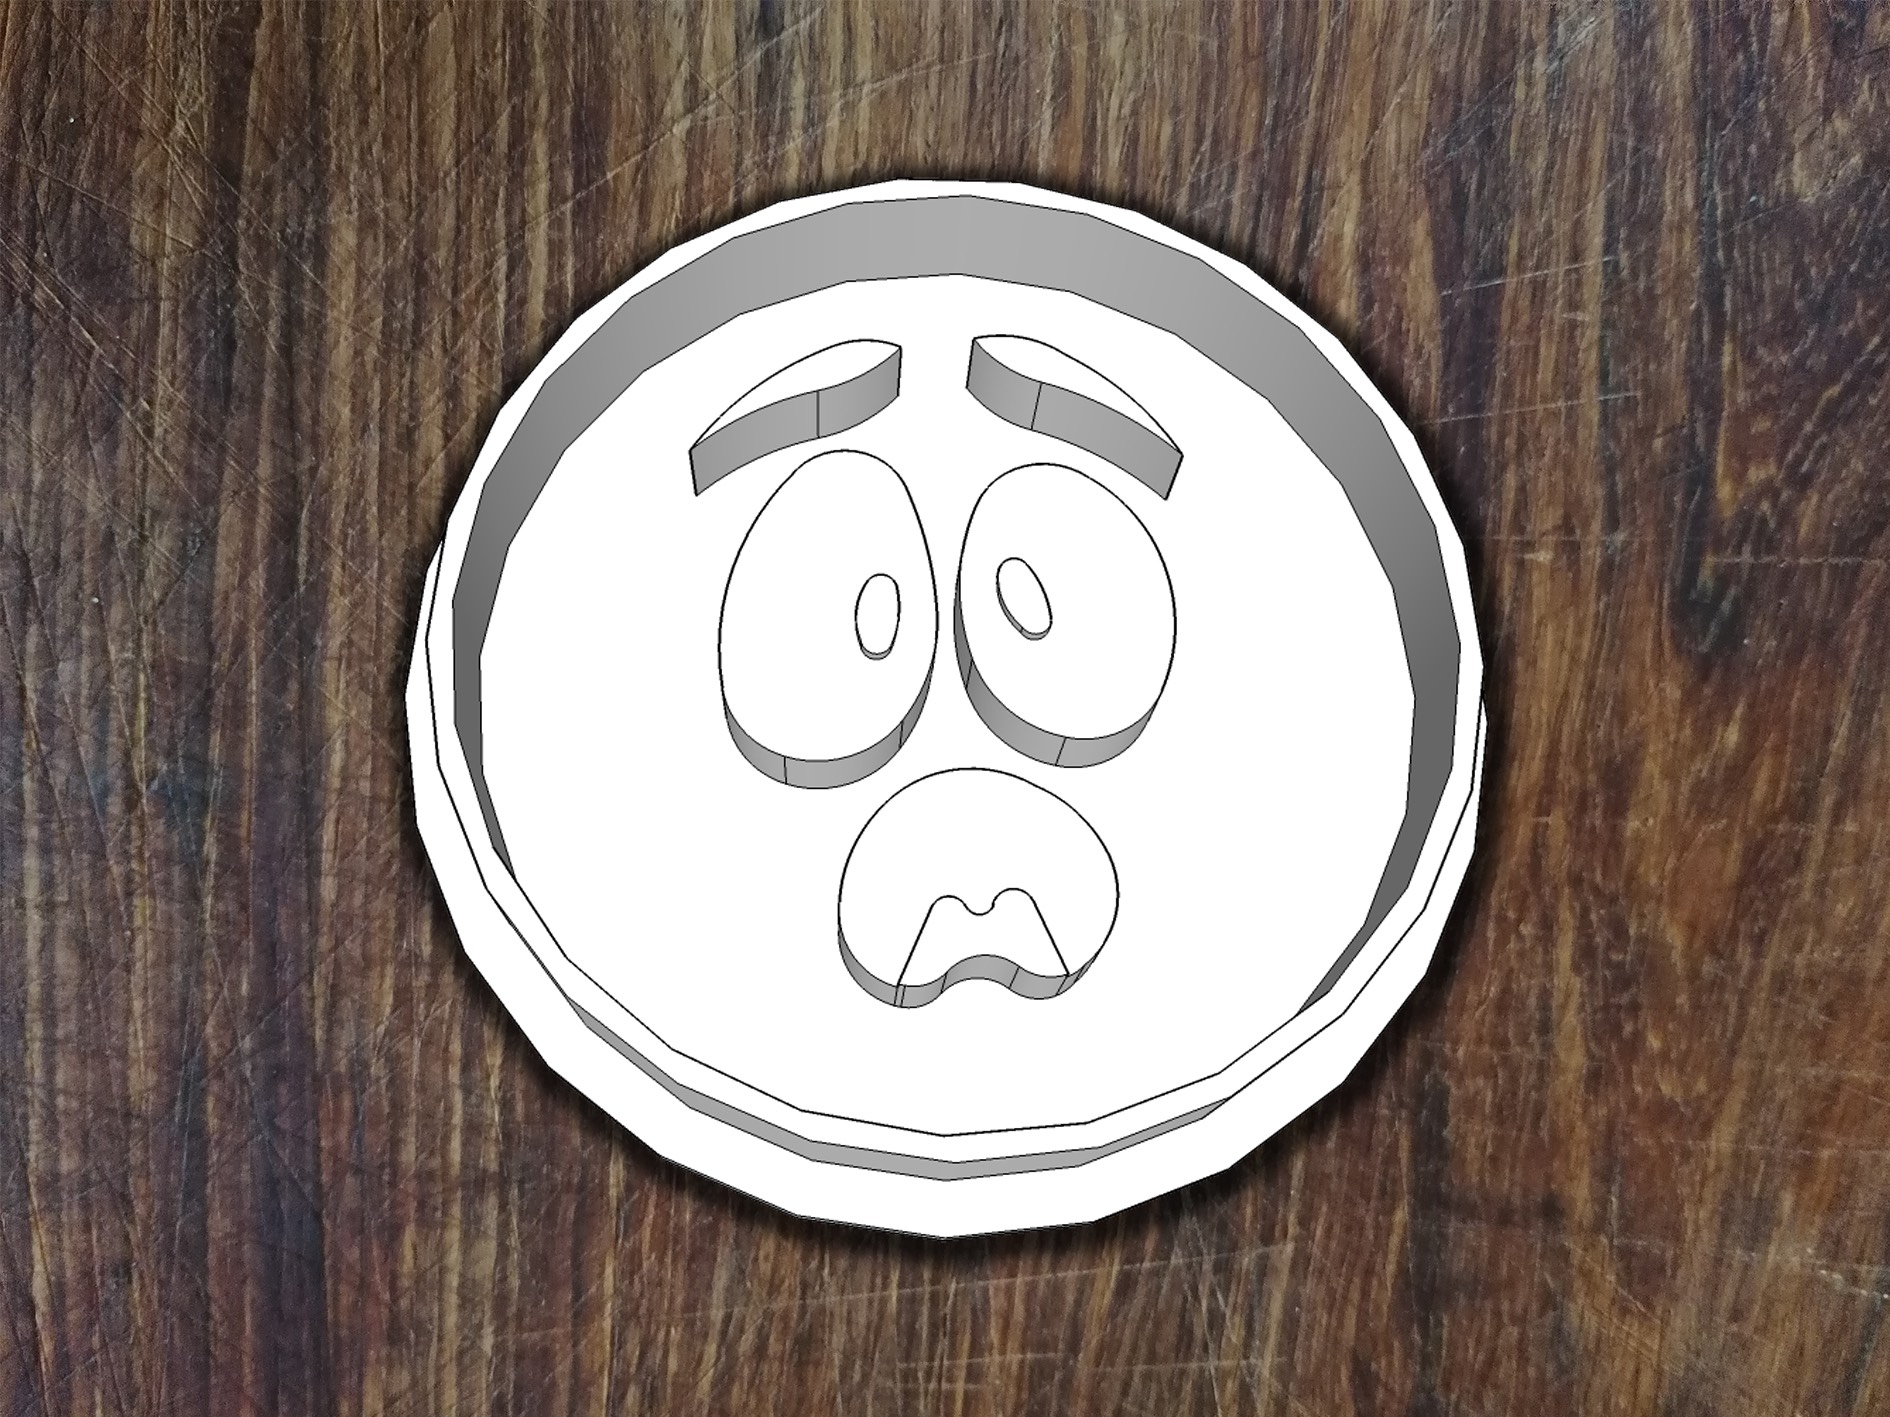 Suprise Emoti-Cookie